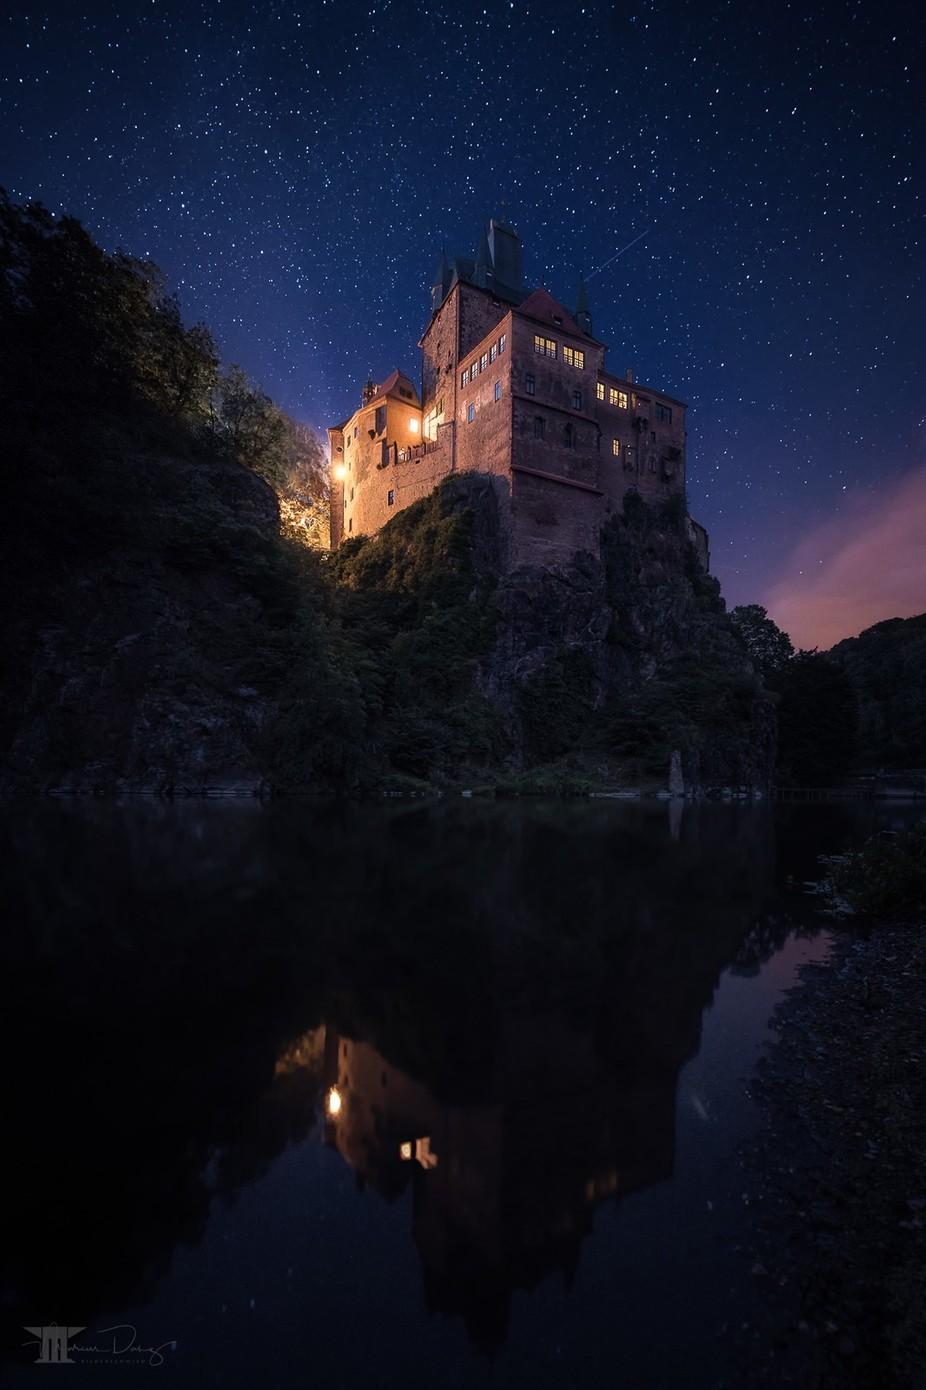 Castle Kriebstein under the stars by Bilderschmied-Danz - Covers Photo Contest Vol 41